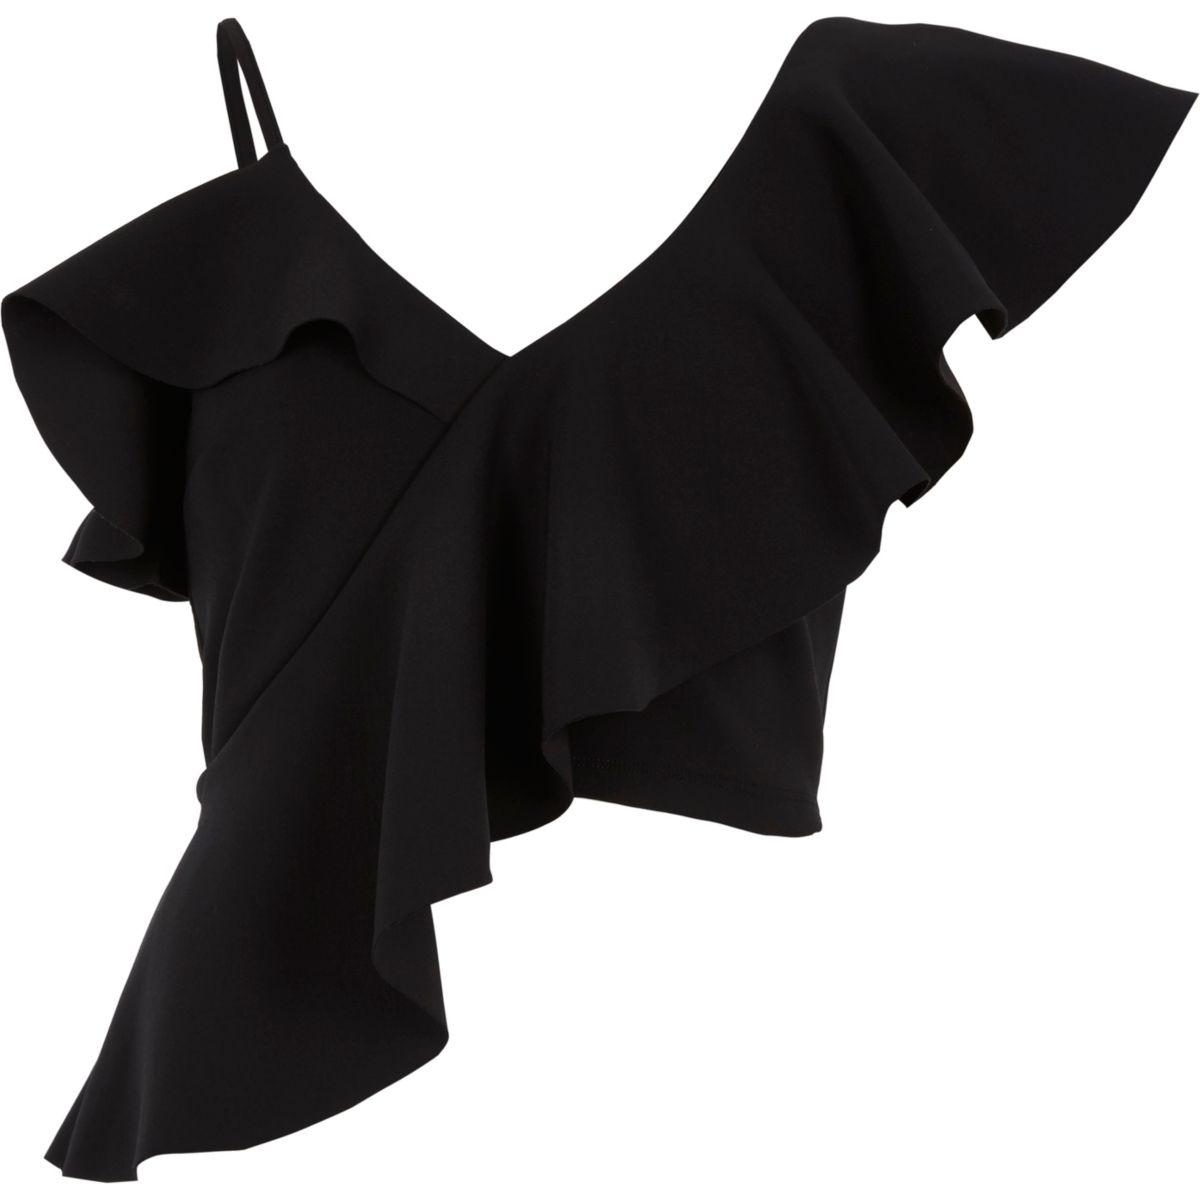 Black asymmetric frill crop top